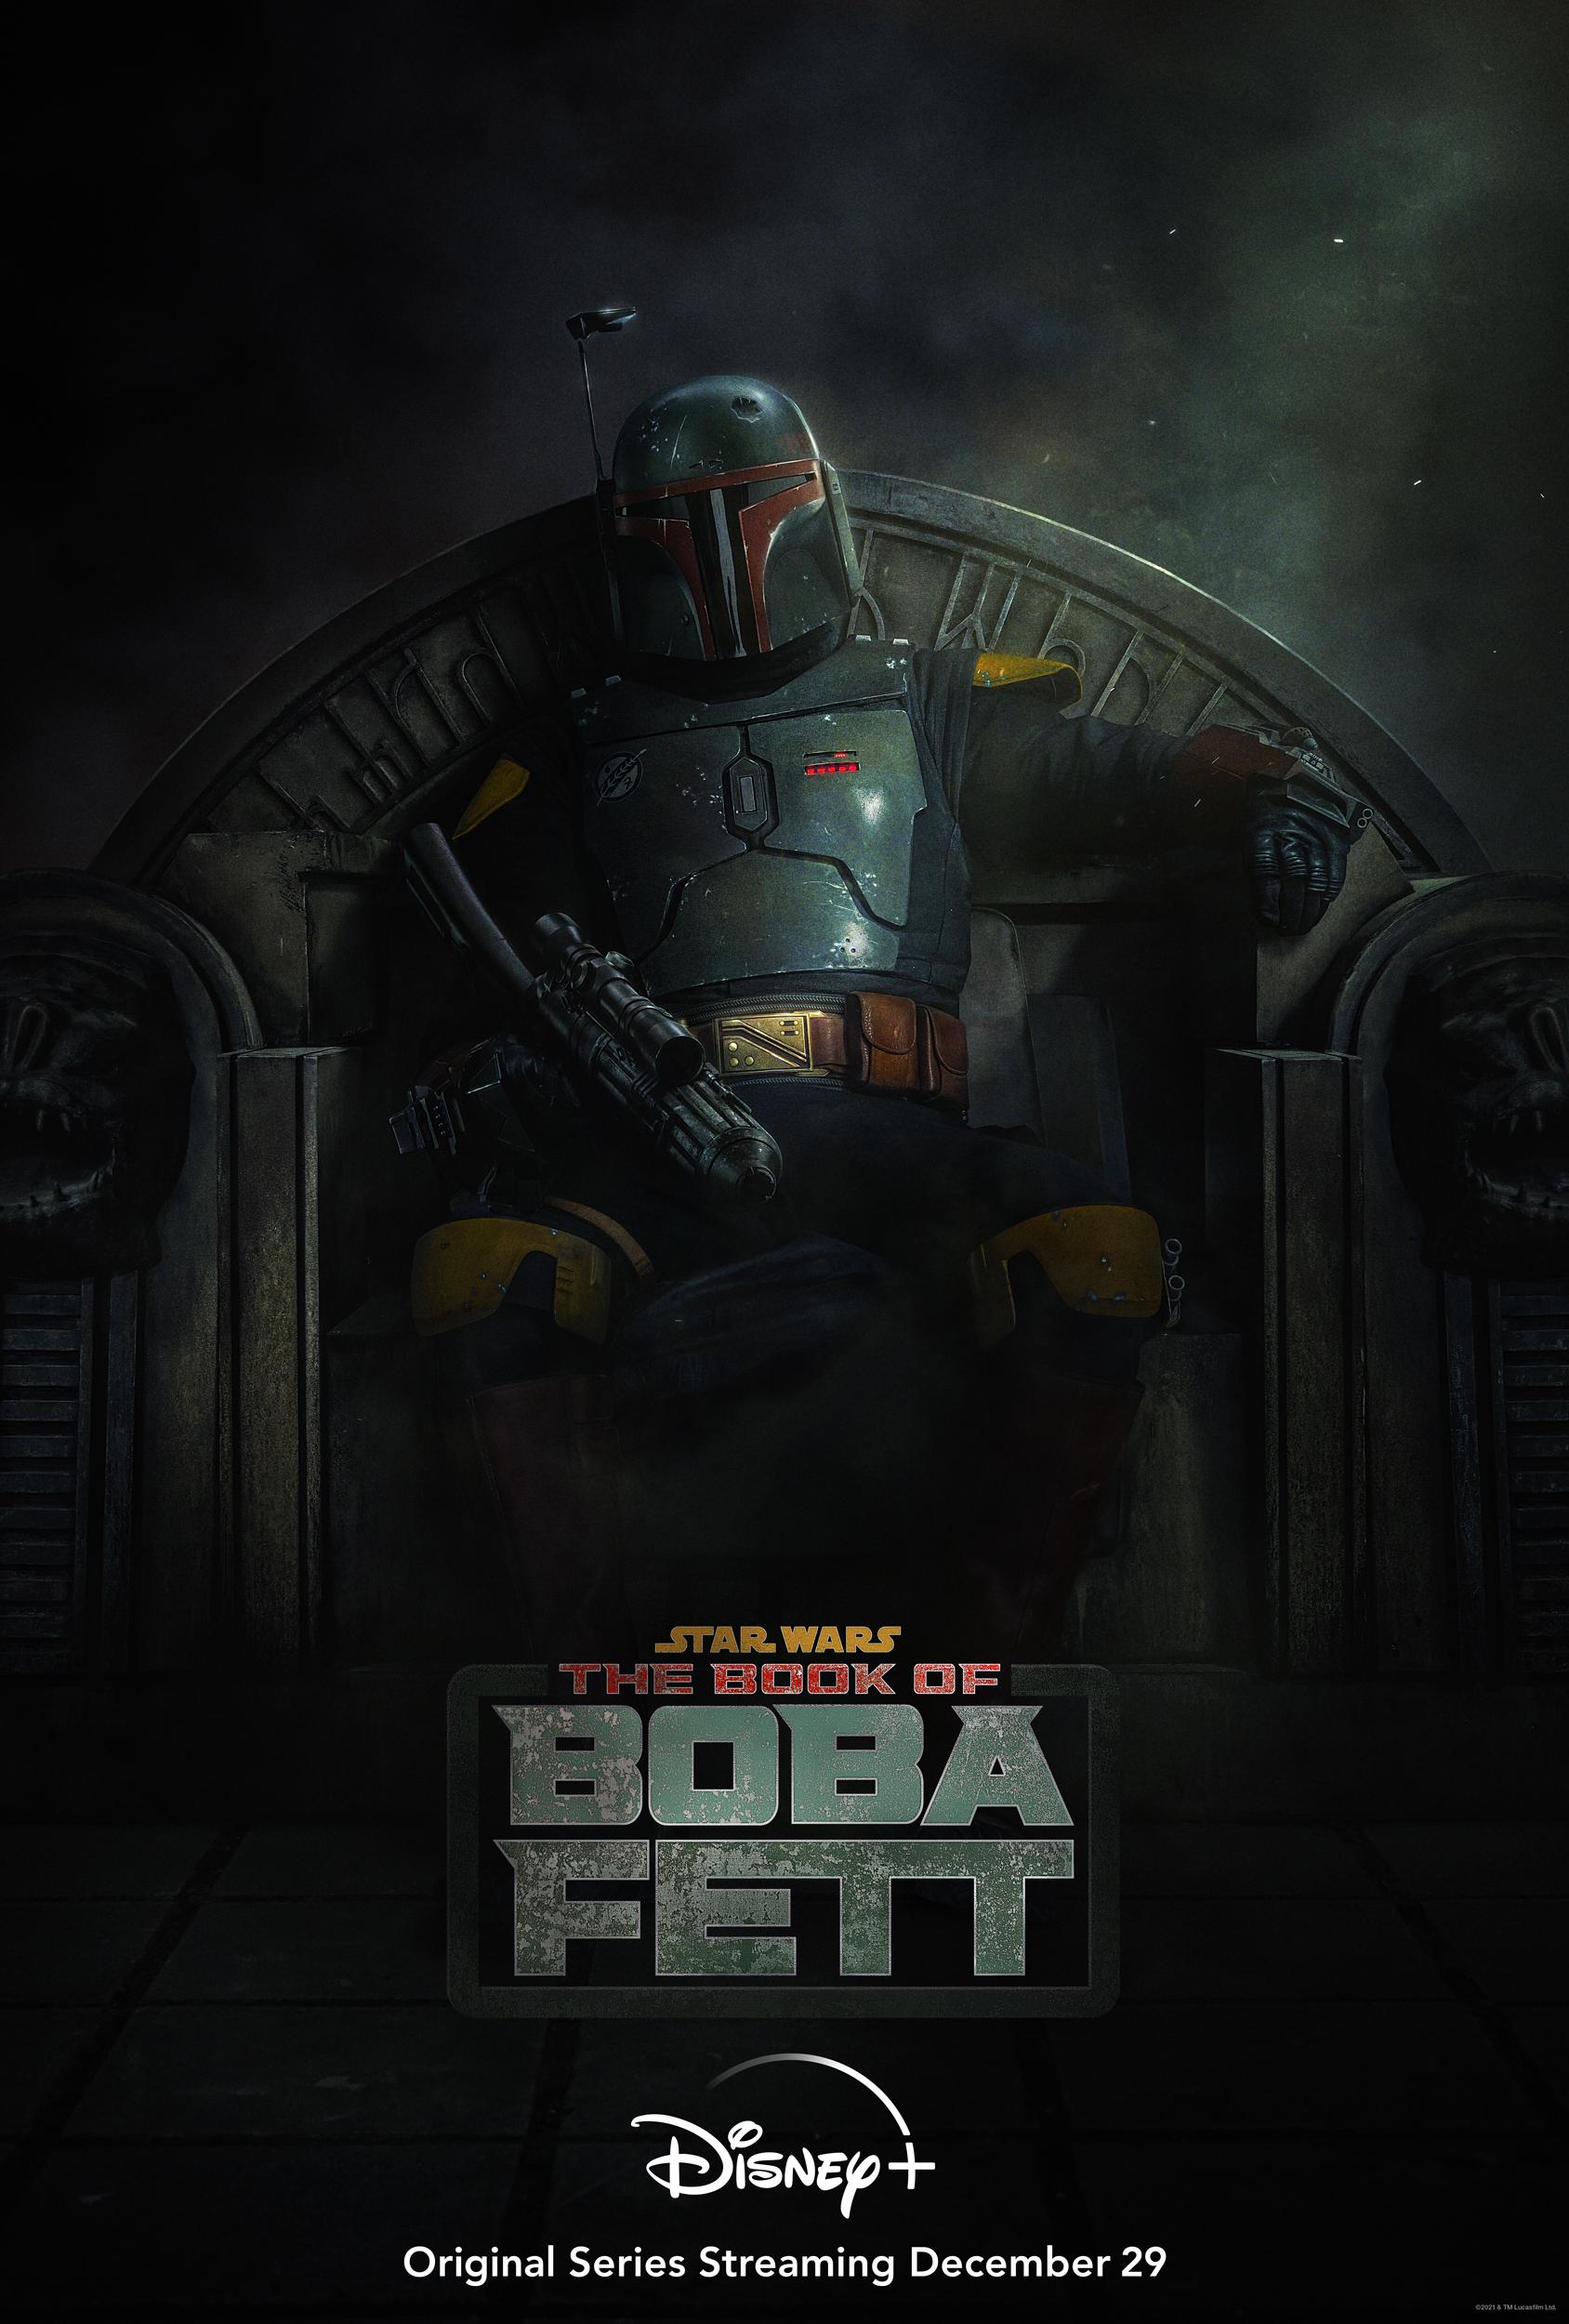 Star Wars The Book of Boba Fett